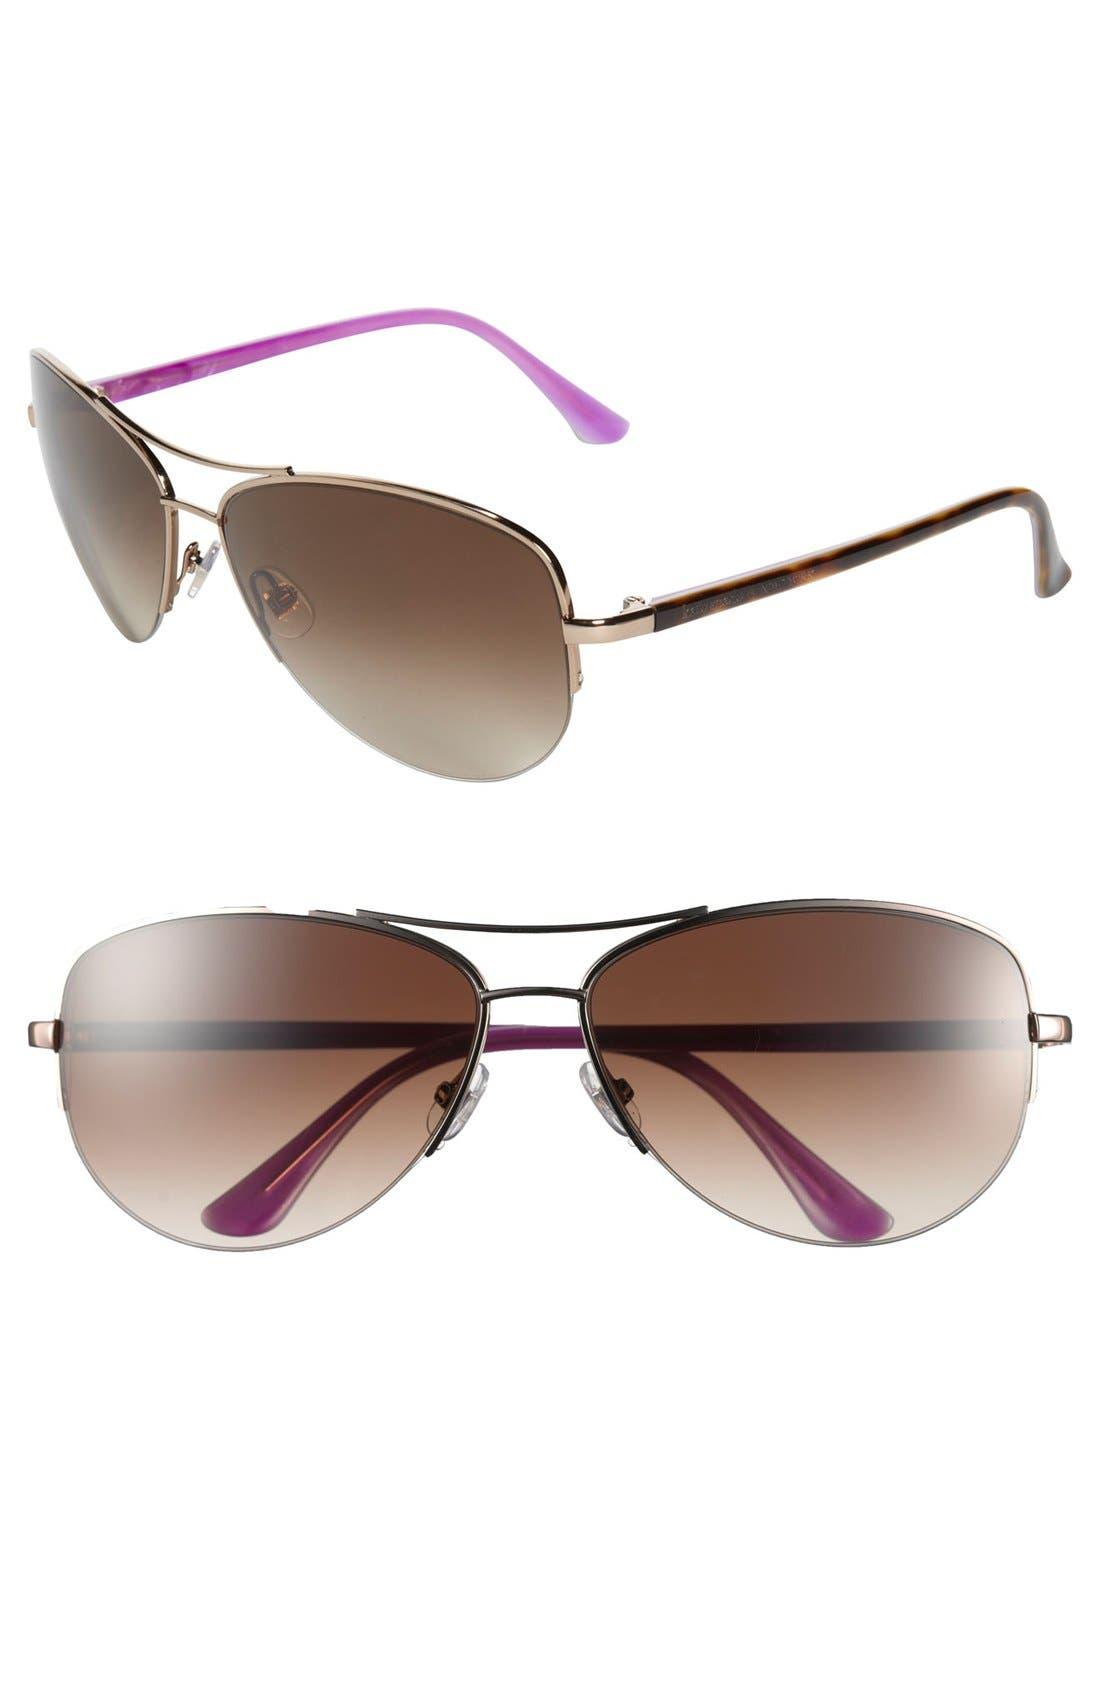 Main Image - kate spade new york 'elysia' 61mm rimless aviator sunglasses